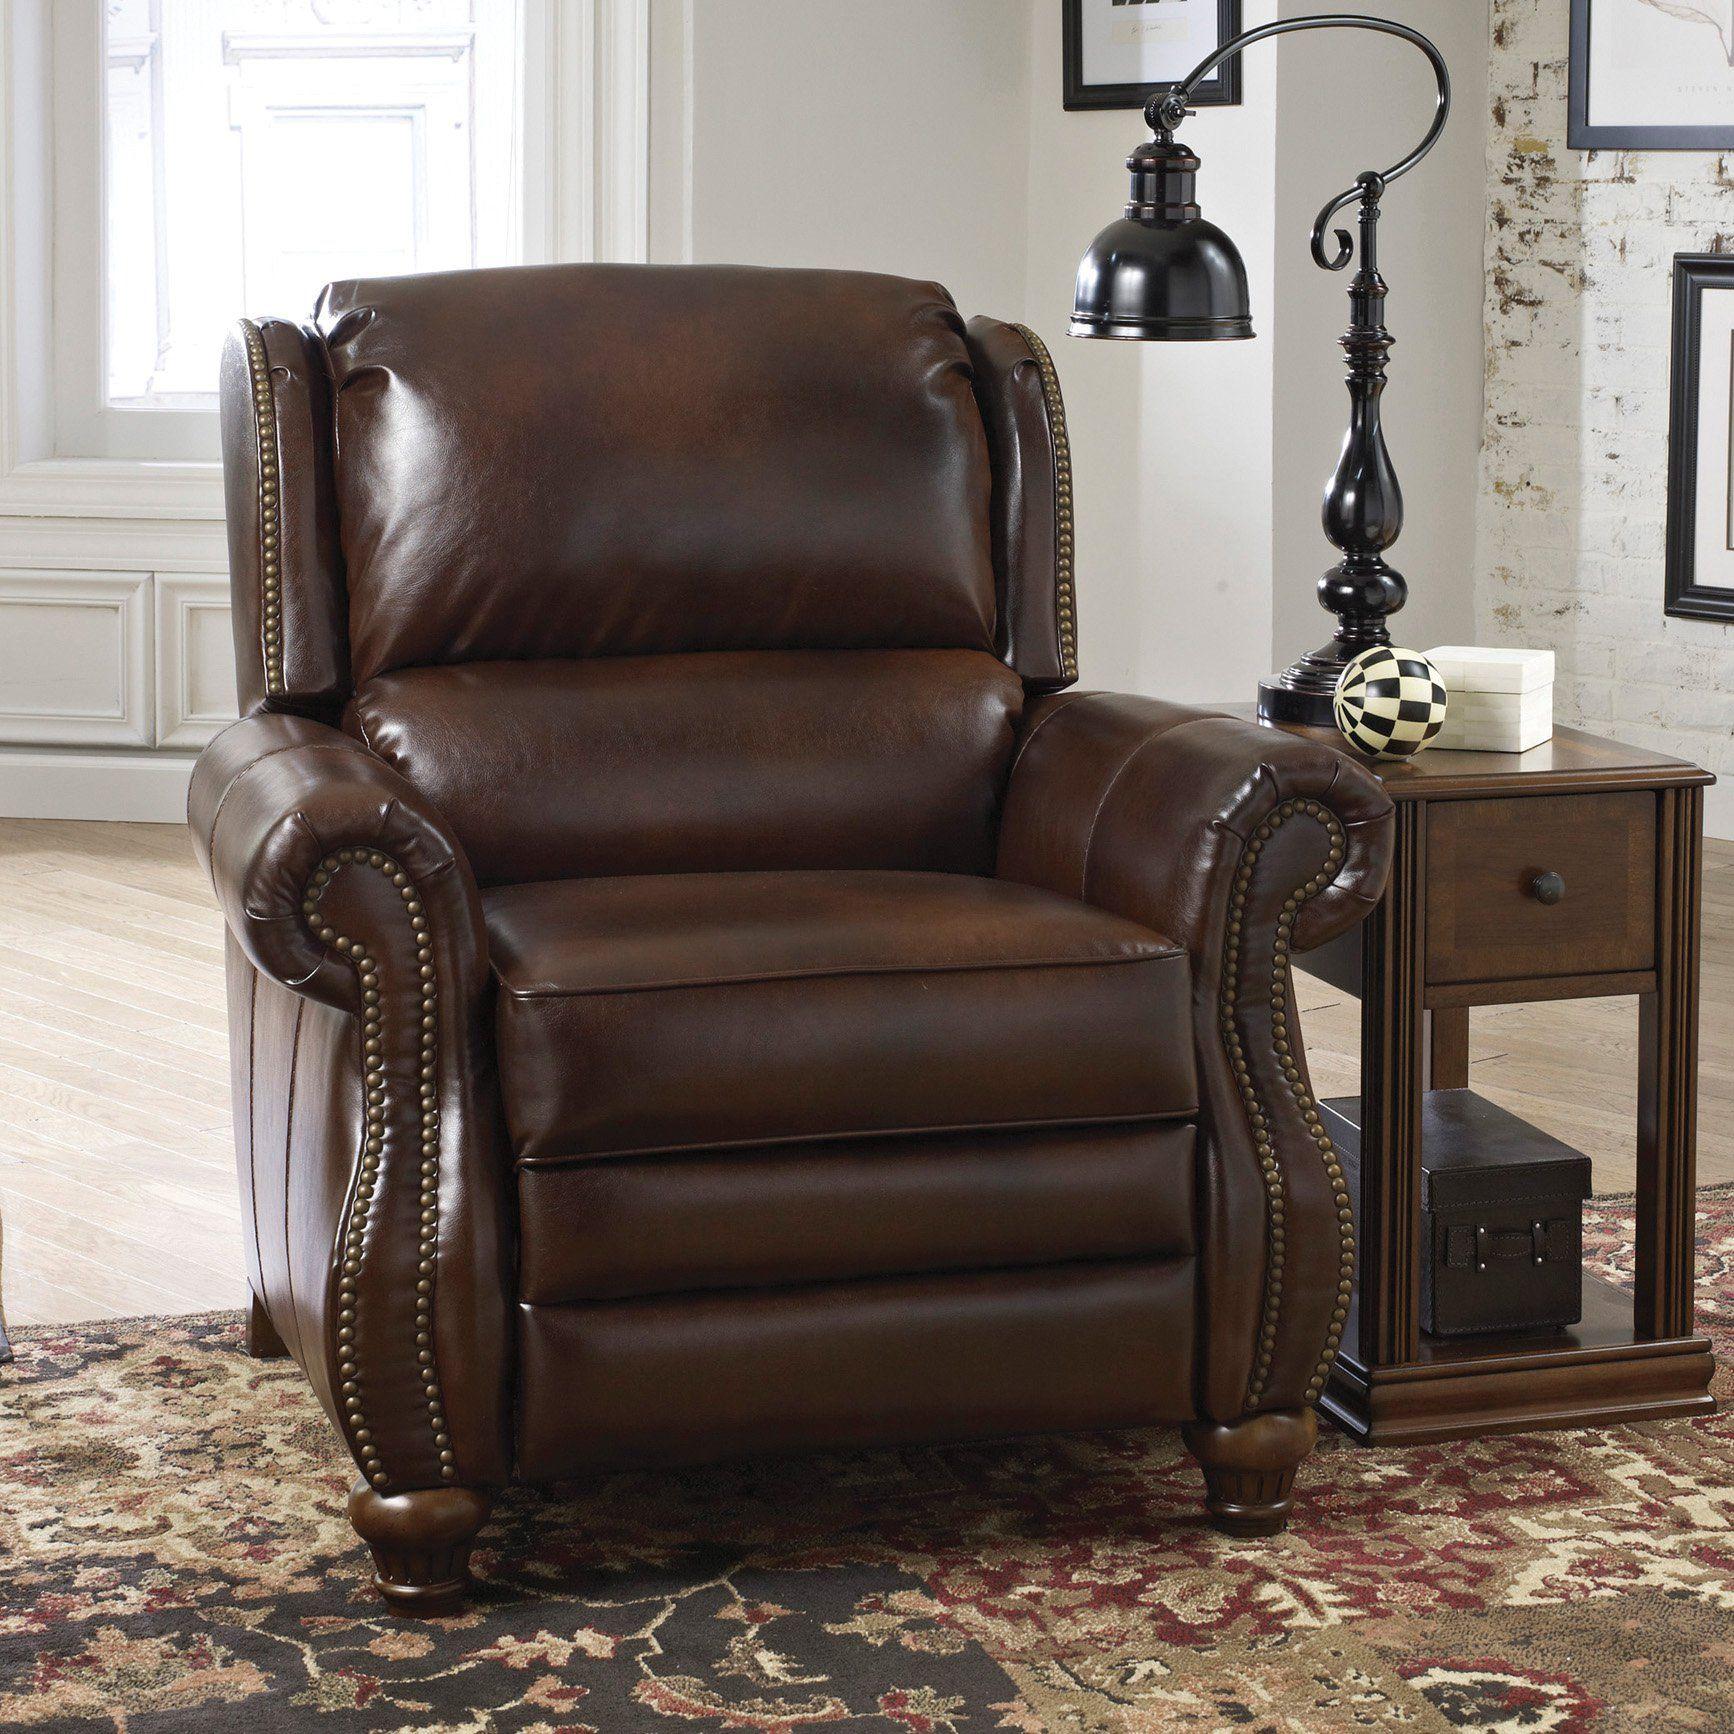 Signature Design By Ashley Elberton Lo Leg Recliner In Espresso Ay 2060030 Recliner Ashley Furniture Furniture